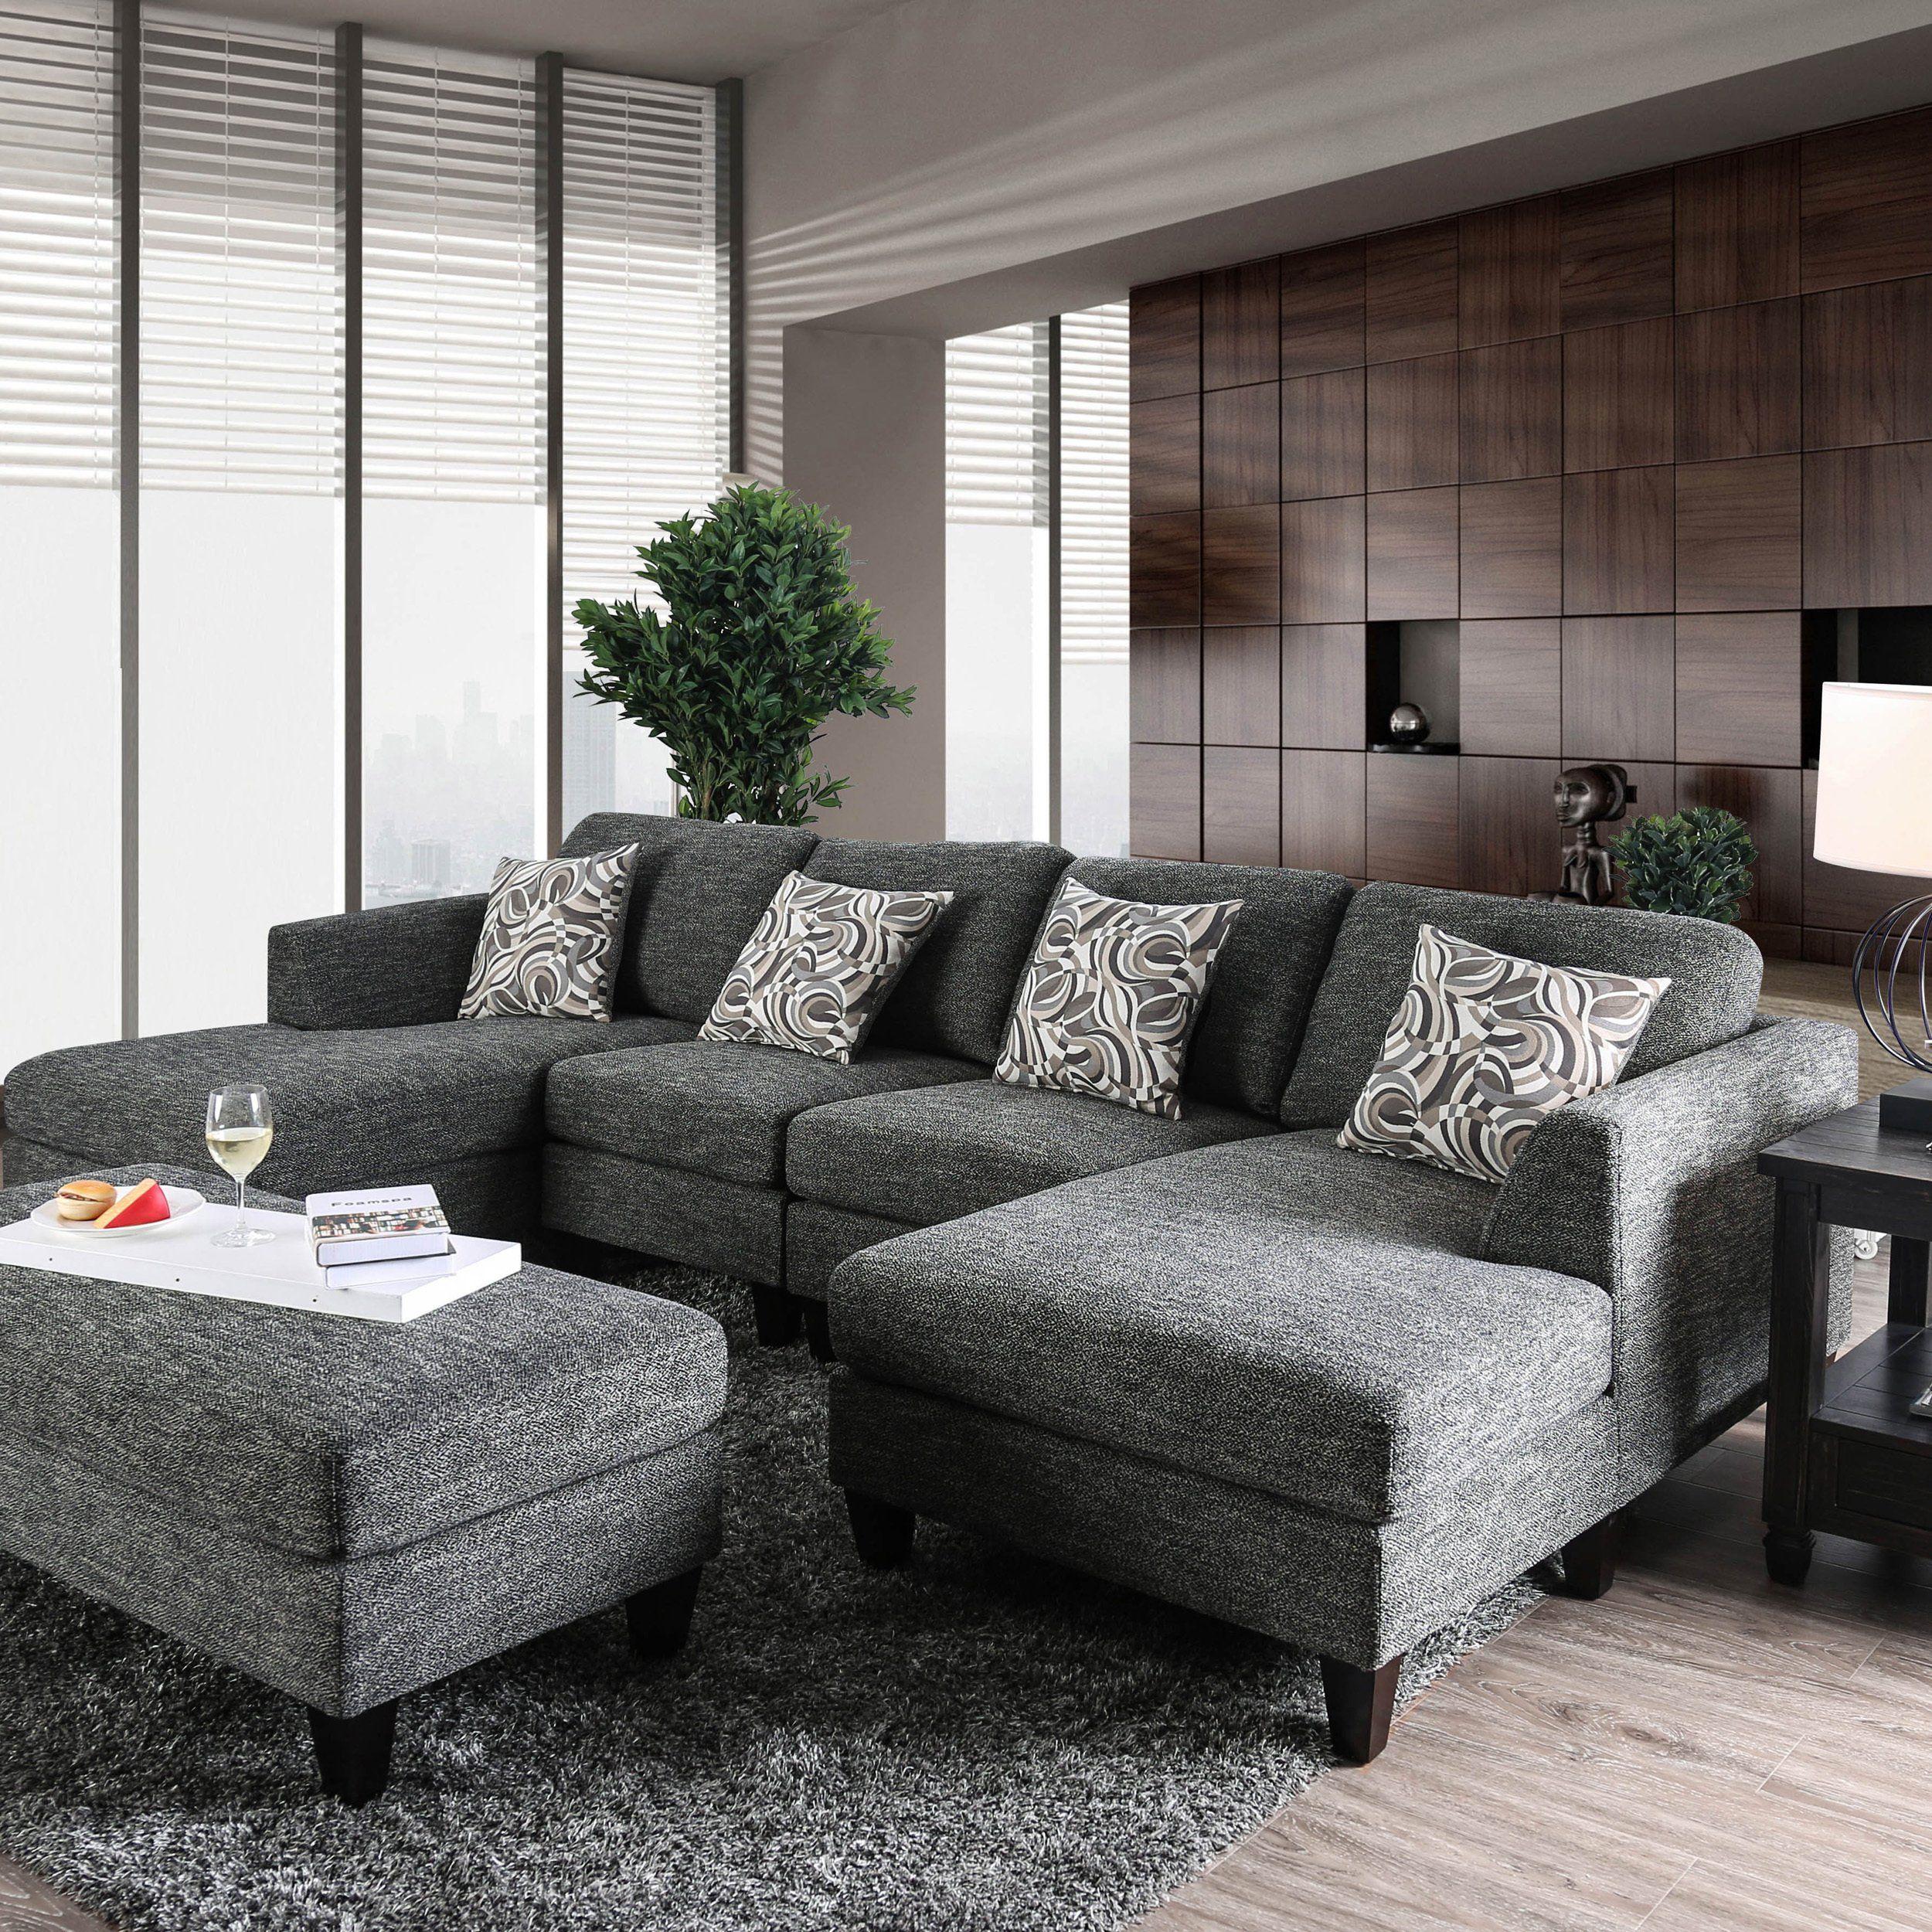 Incredible Breckenridge Grey 4 Piece Chenille Modular Sectional Sofa By Machost Co Dining Chair Design Ideas Machostcouk